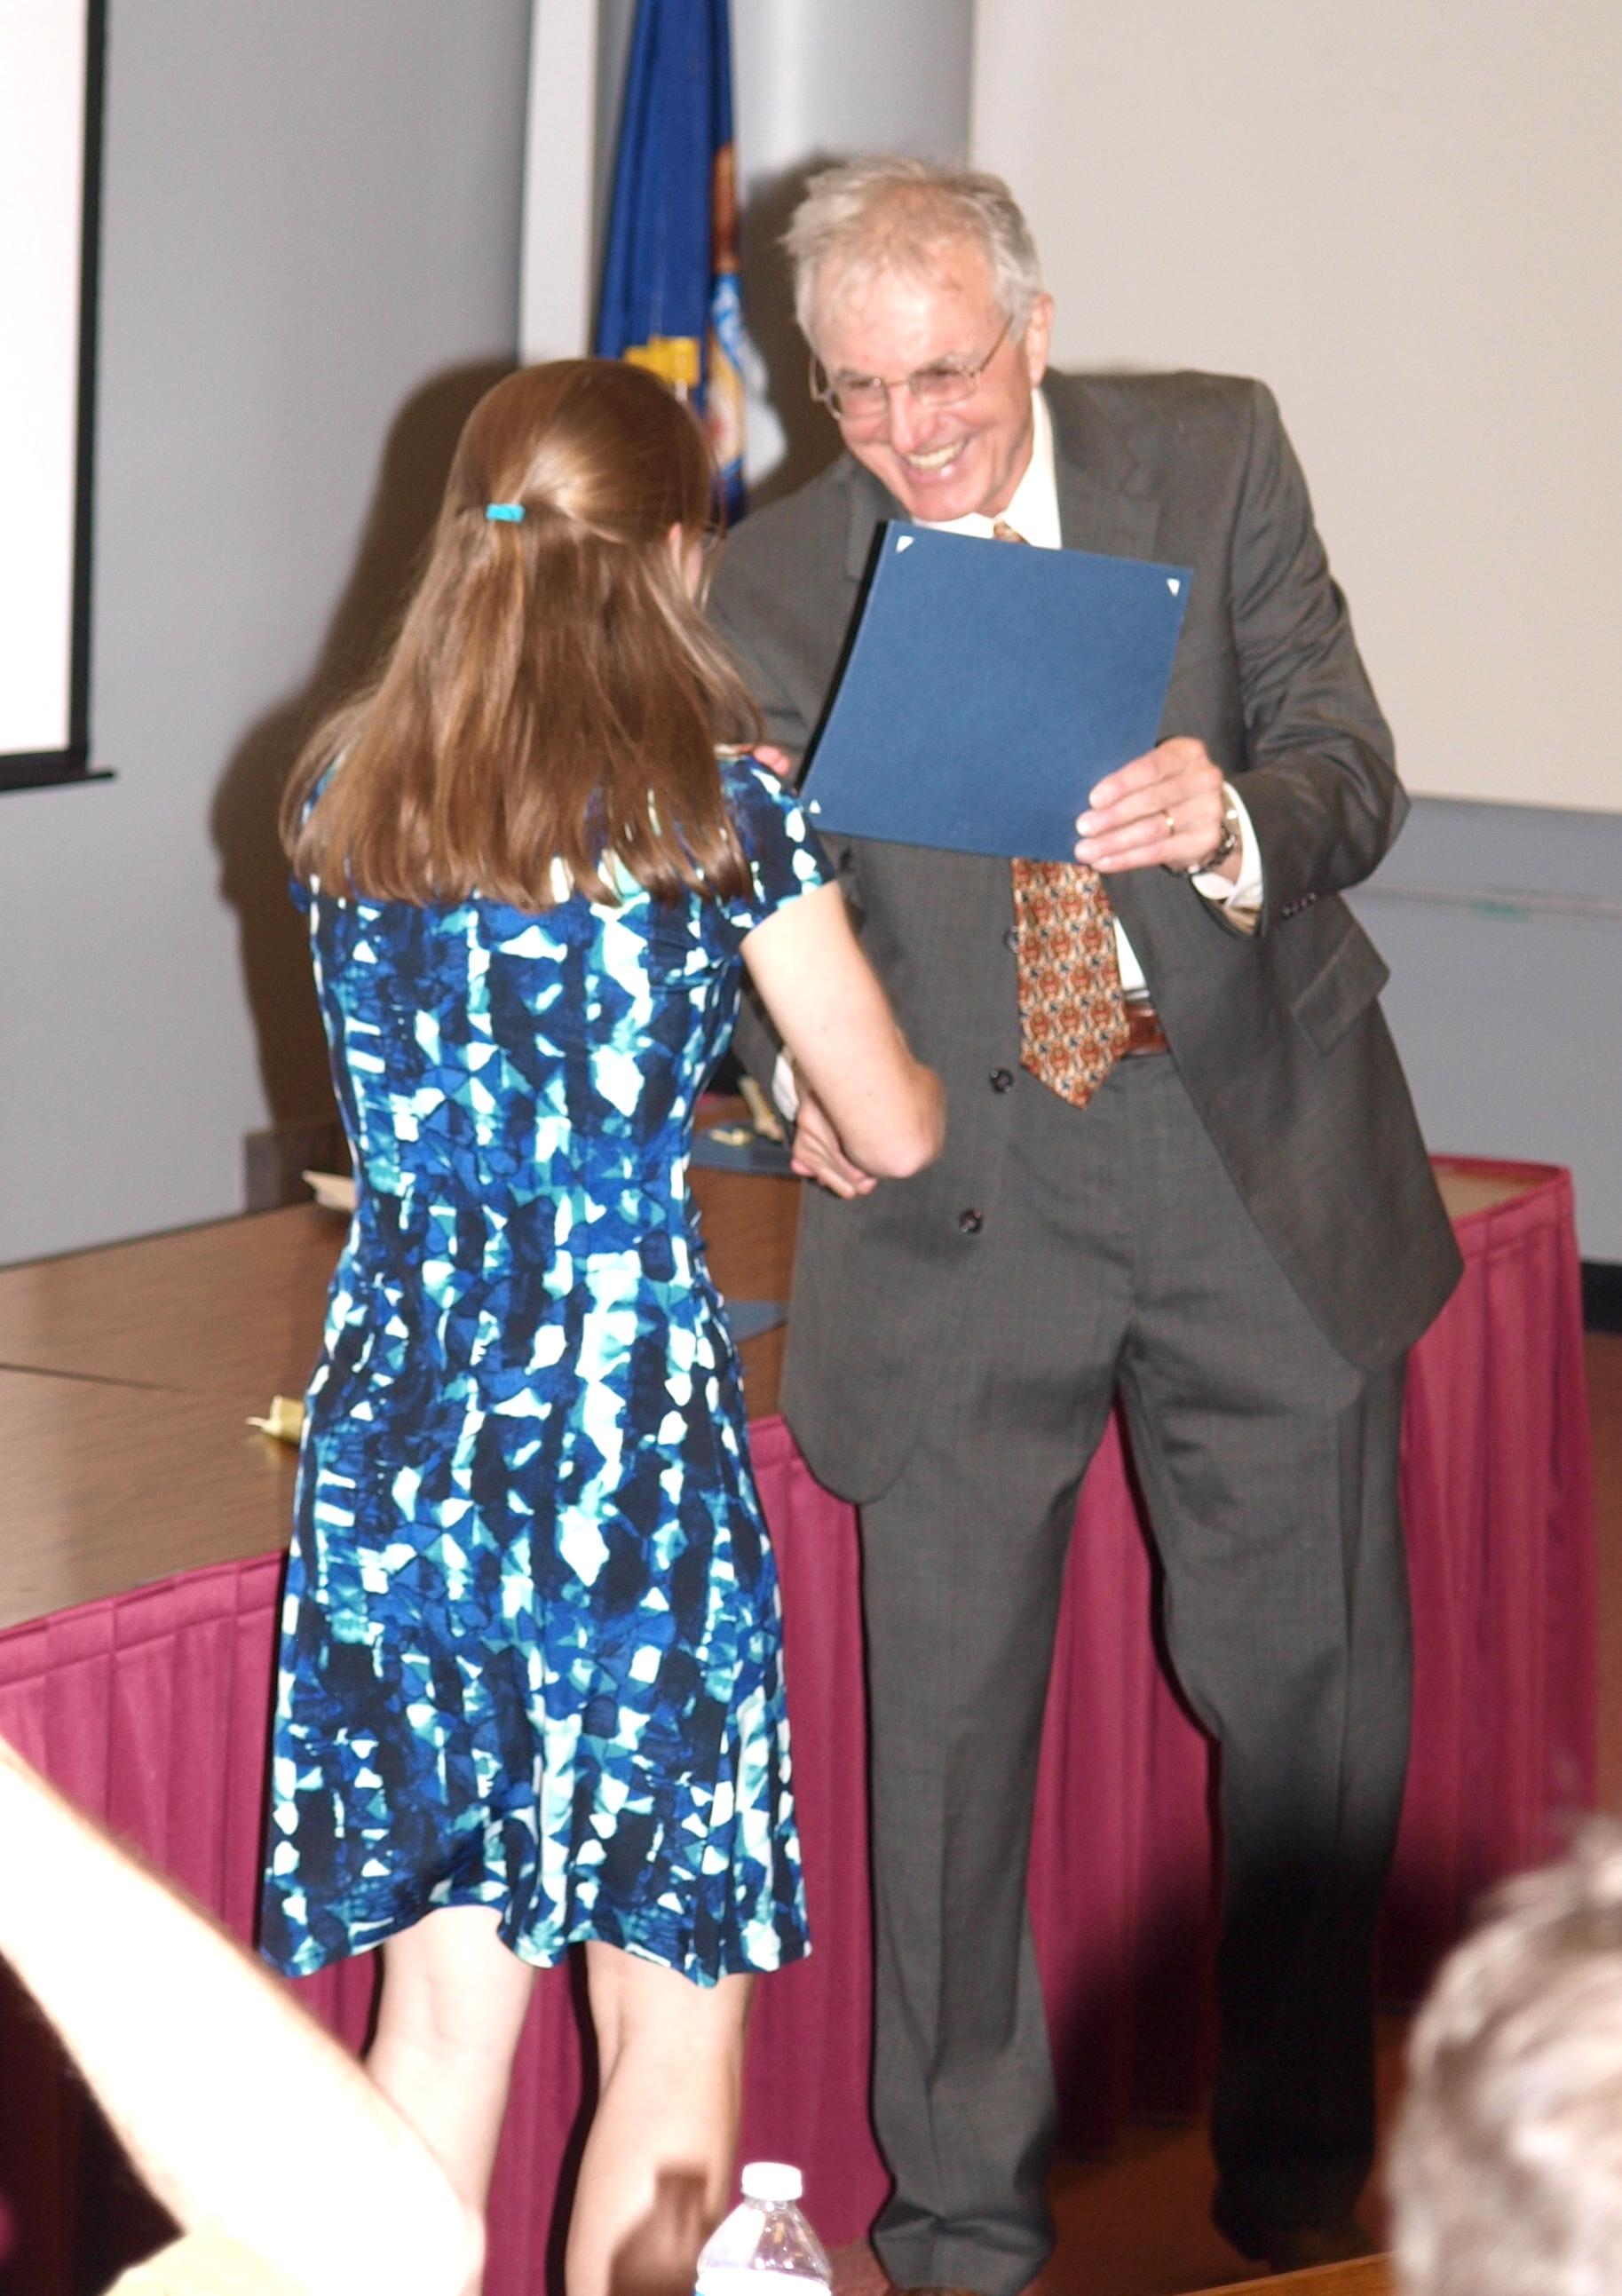 Dr. Michael Daher handing an award to a student